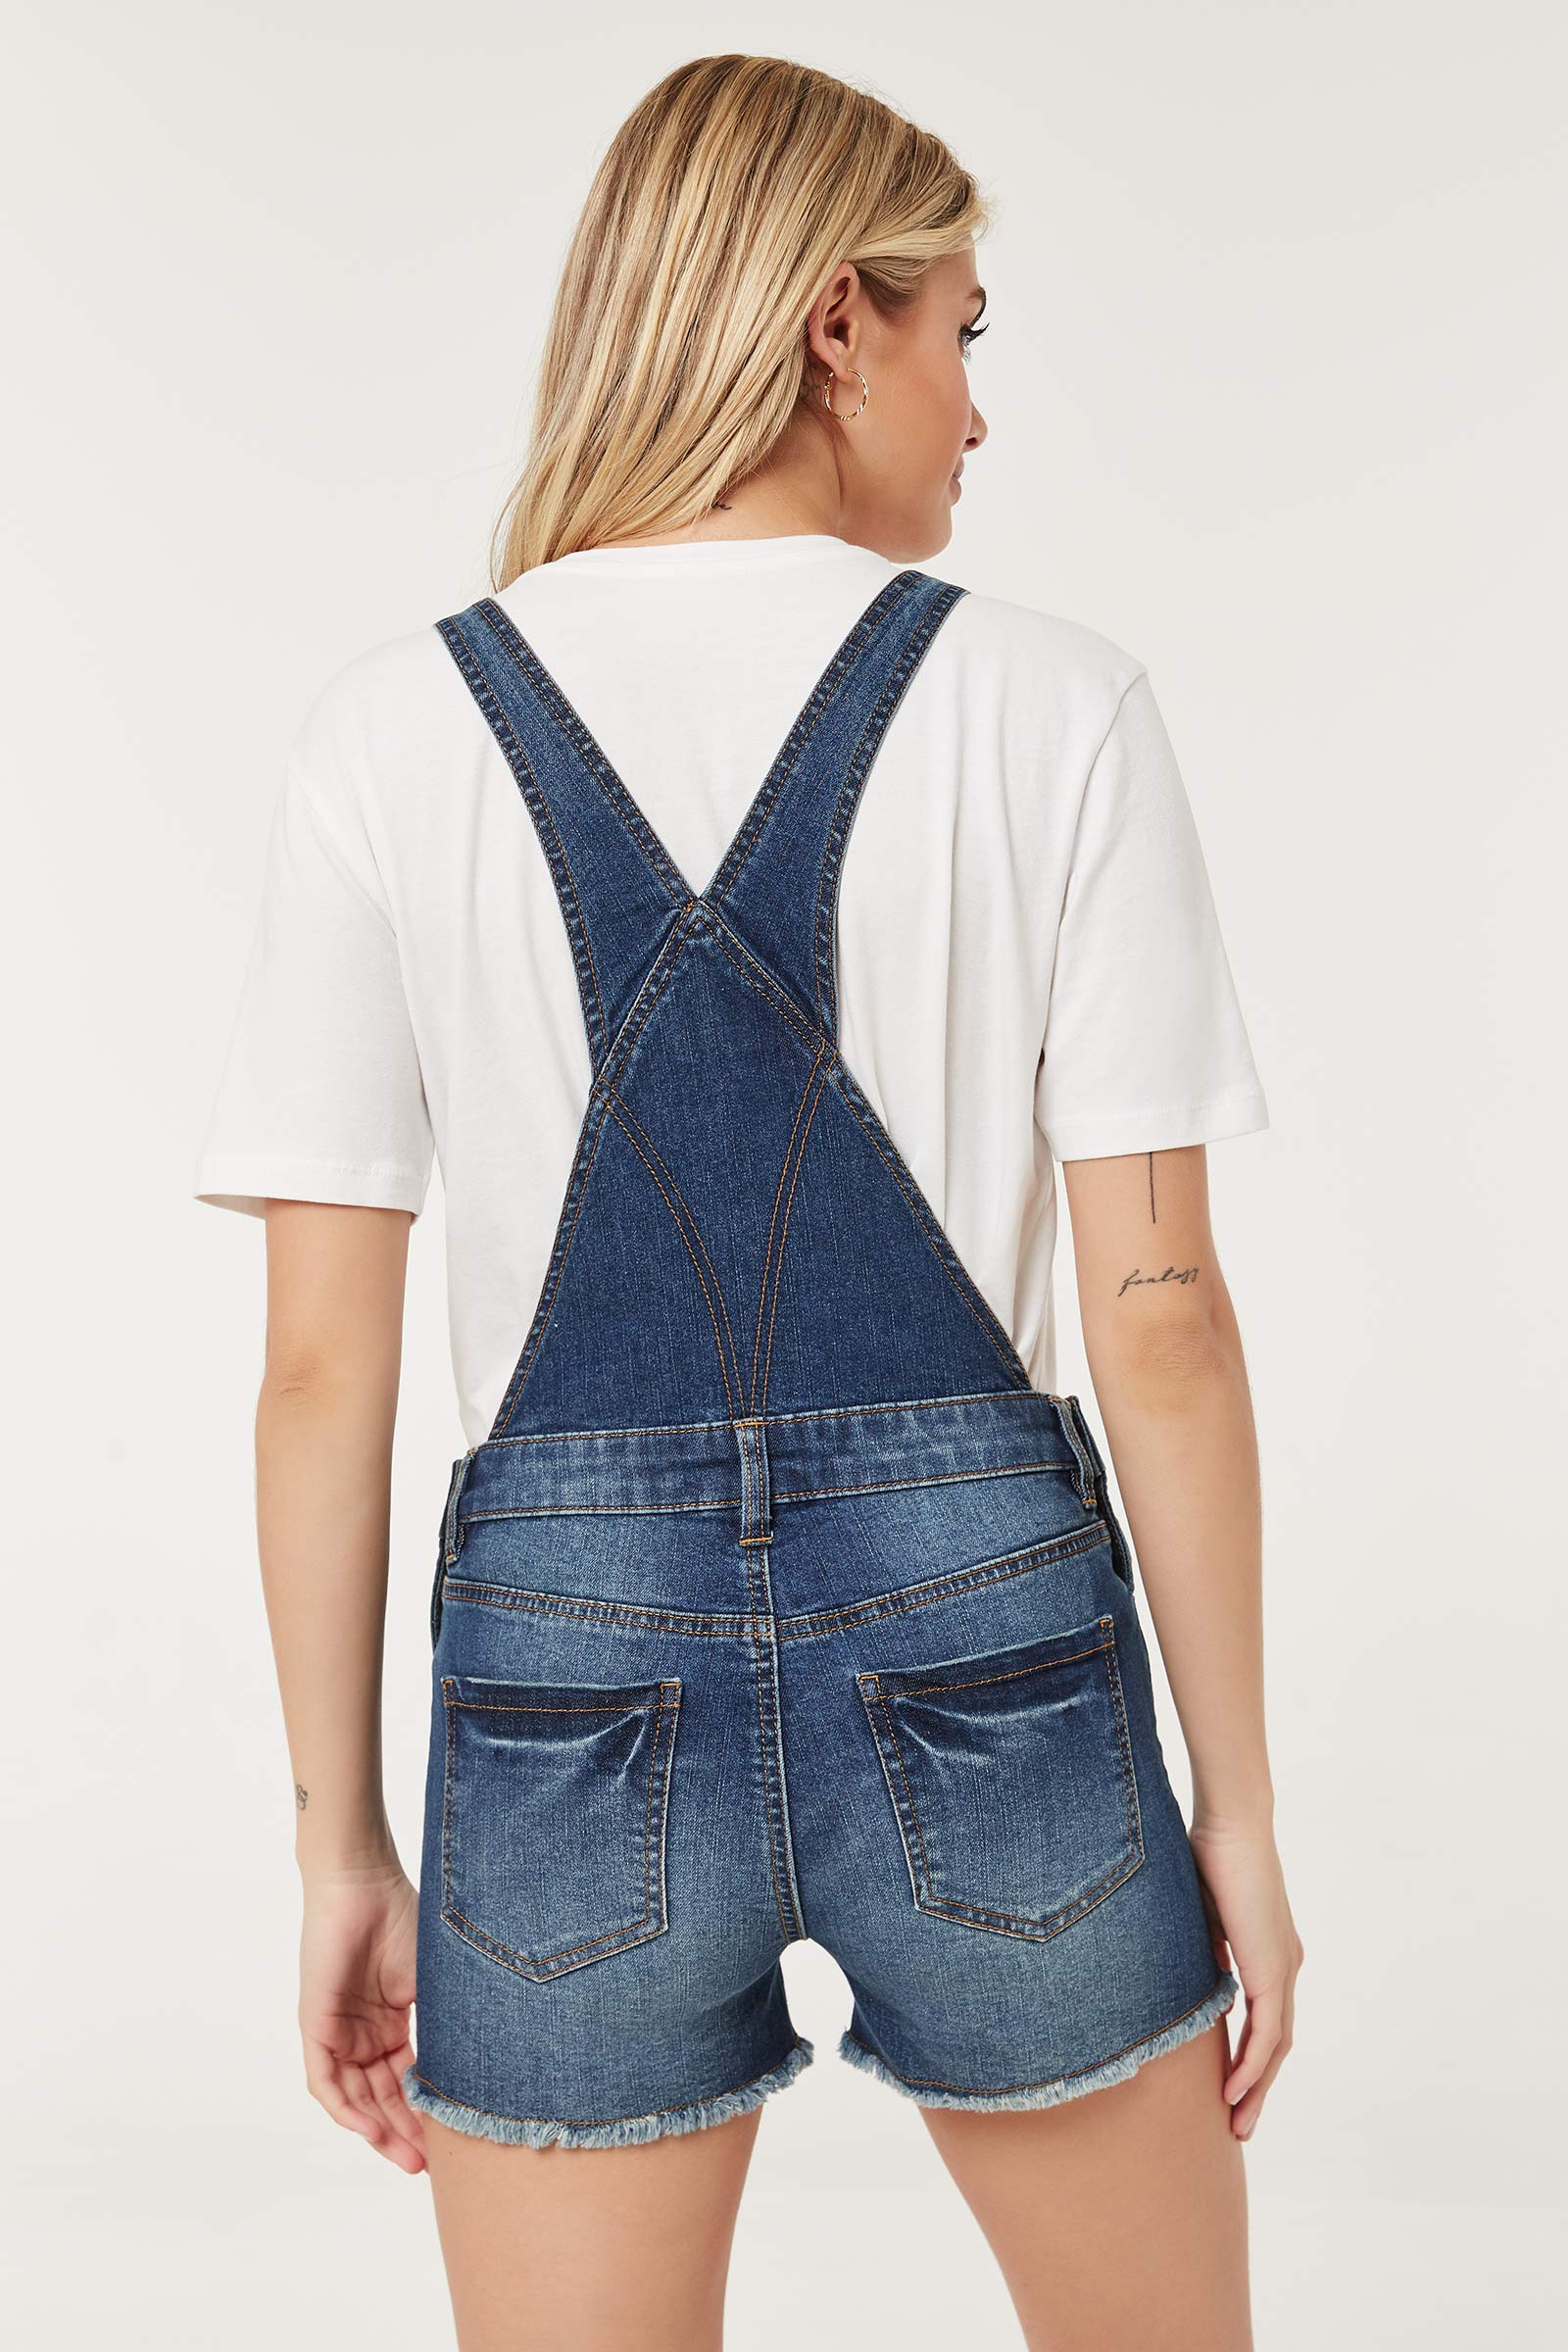 Frayed Jean Short Overalls